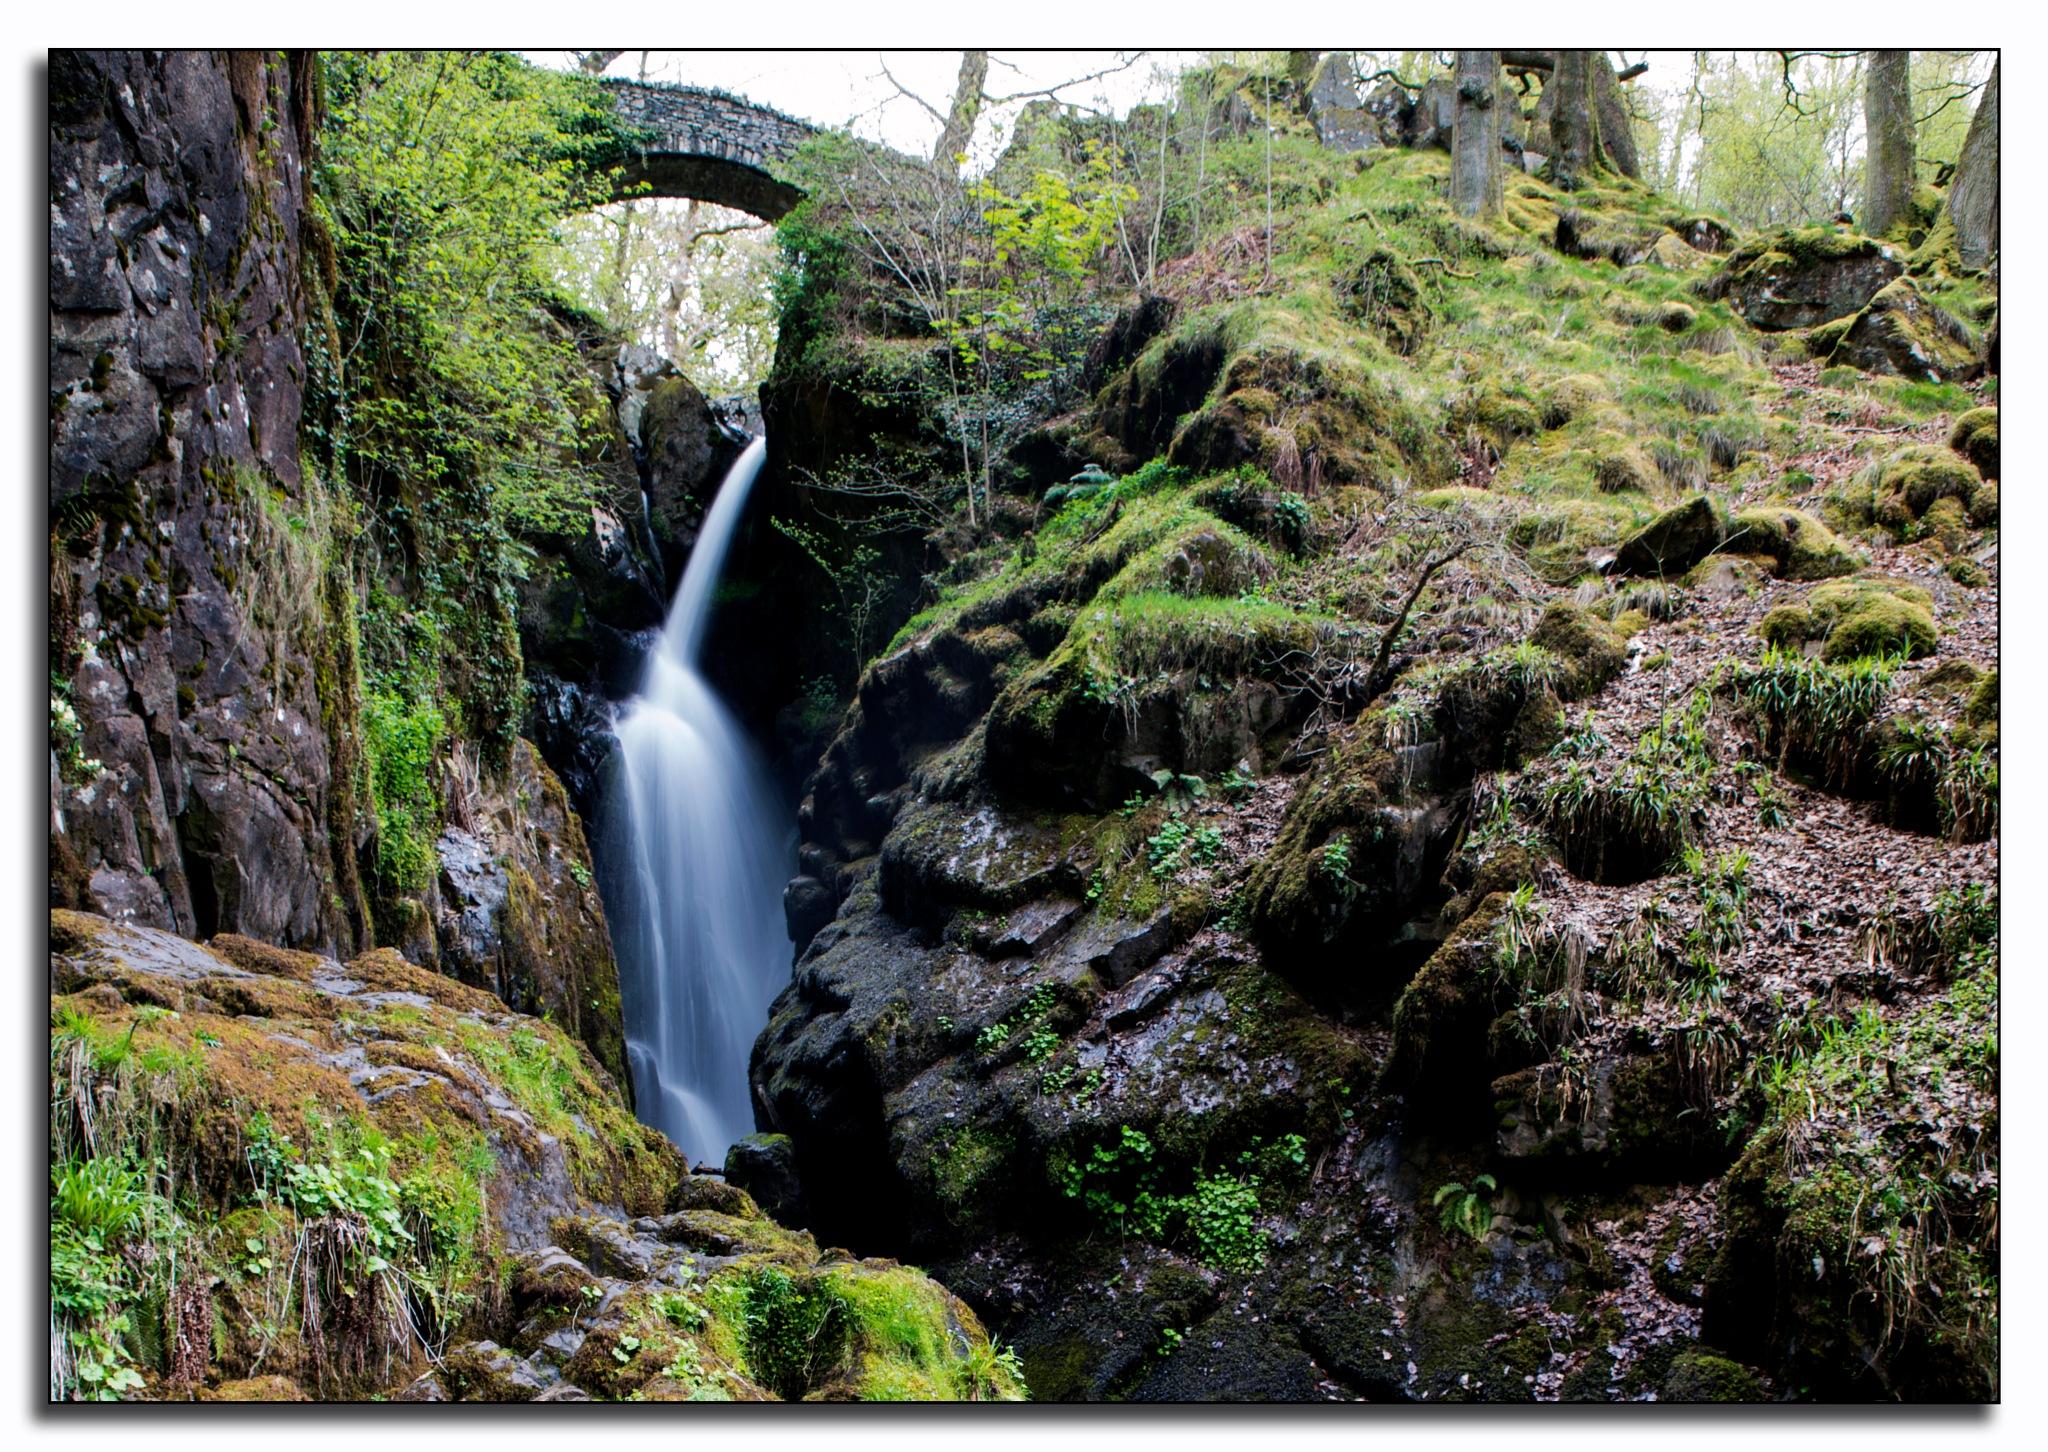 Aira Force Waterfall by Richardbuchan